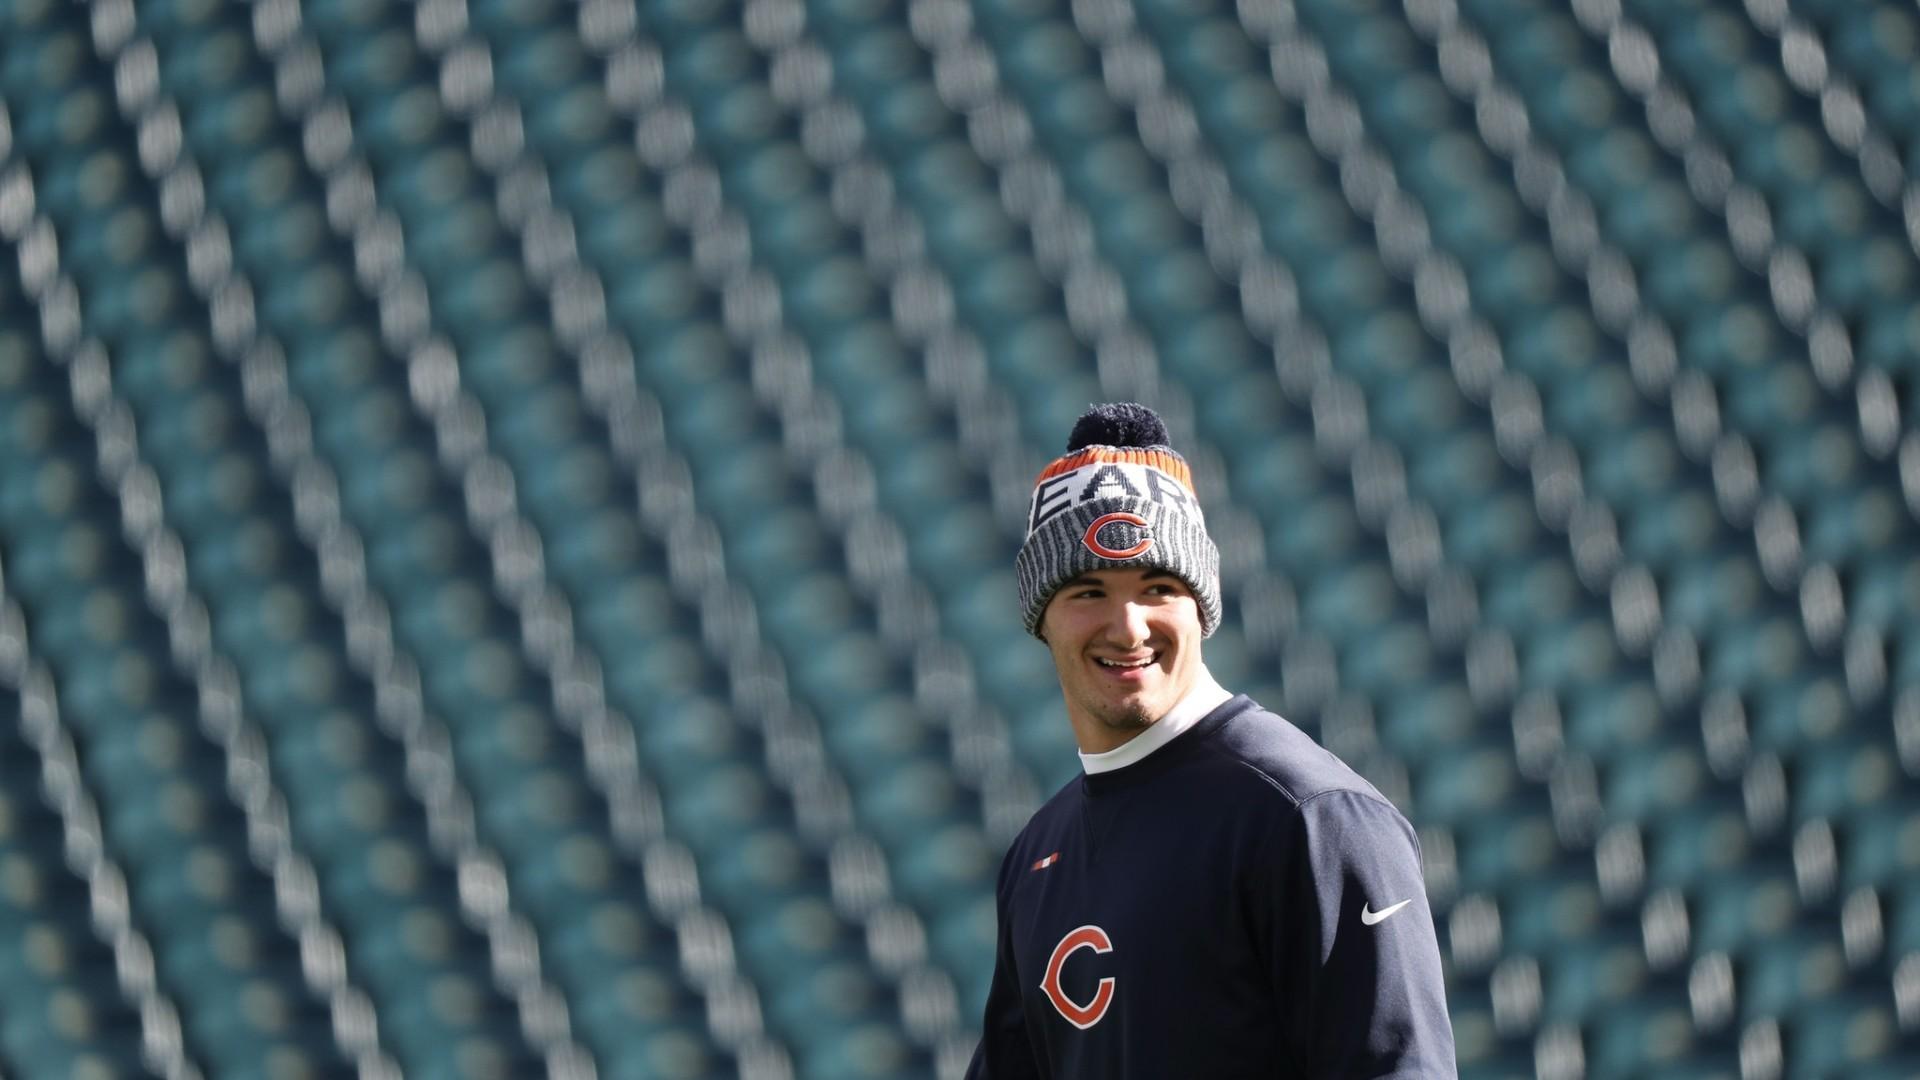 ae0e152b3 Halas Hall Pass  Previewing Bears vs. 49ers - Chicago Tribune